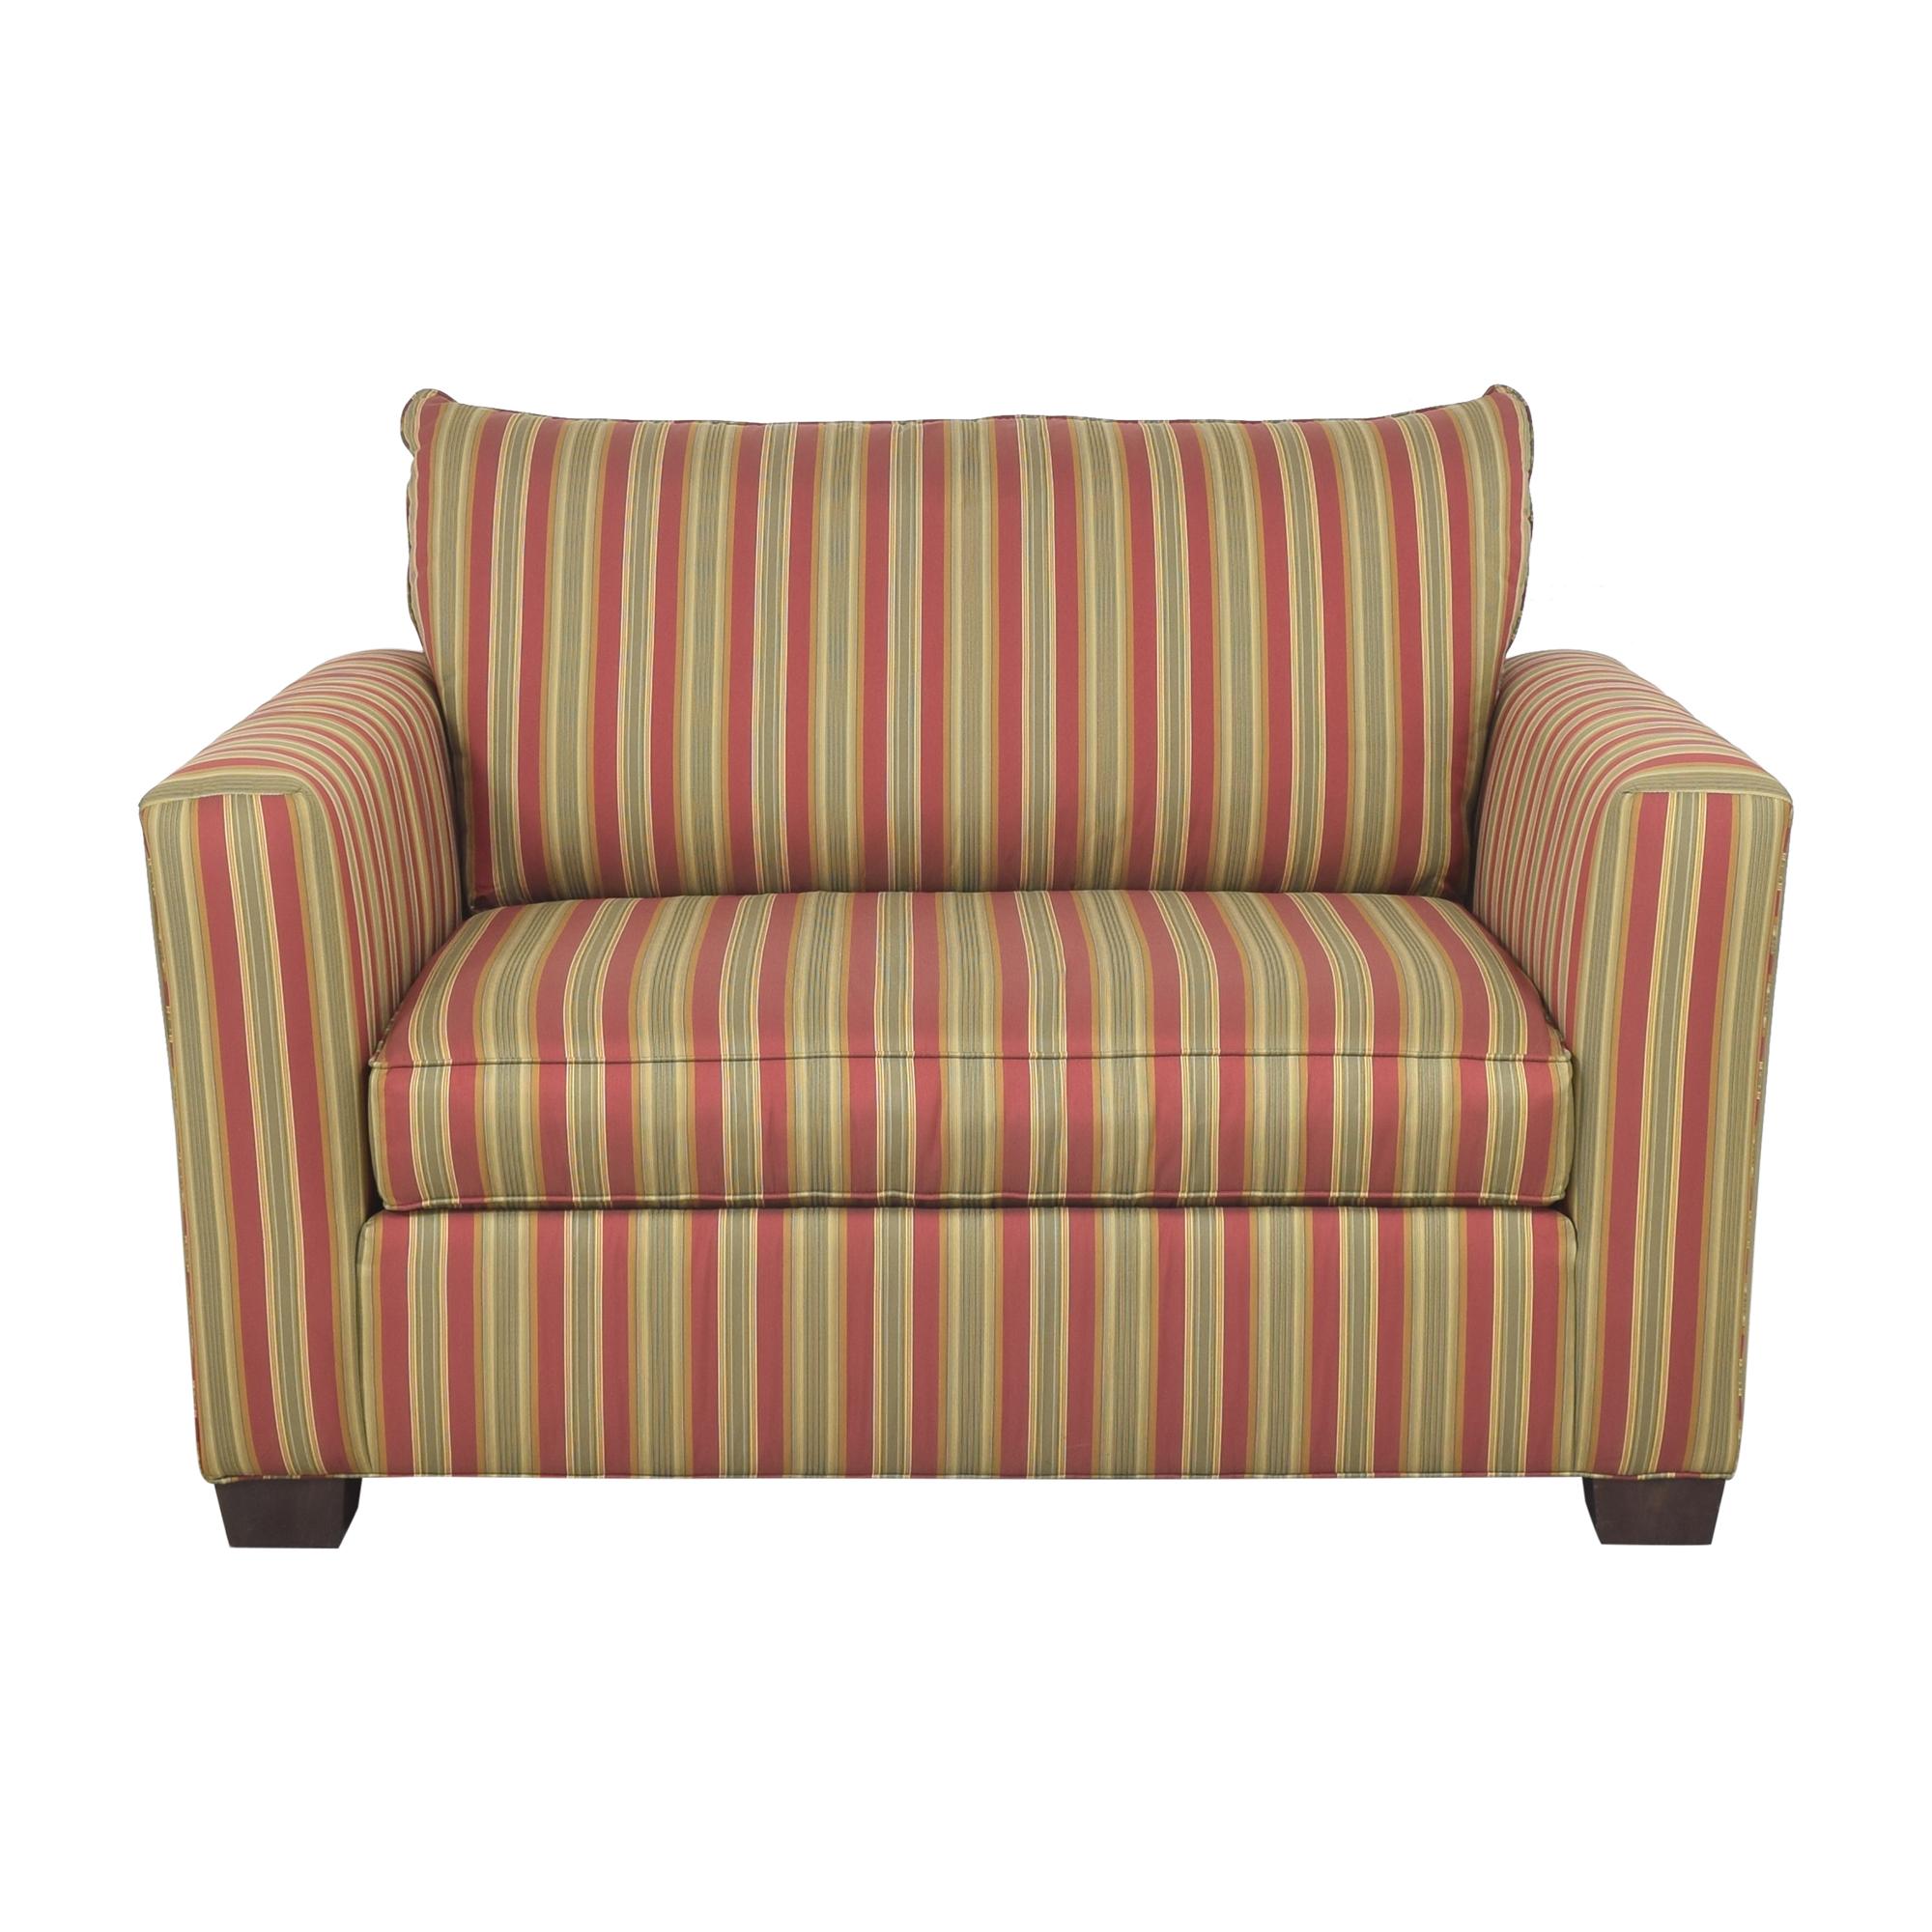 buy Ethan Allen Ethan Allen Hampton Chair and a Half online